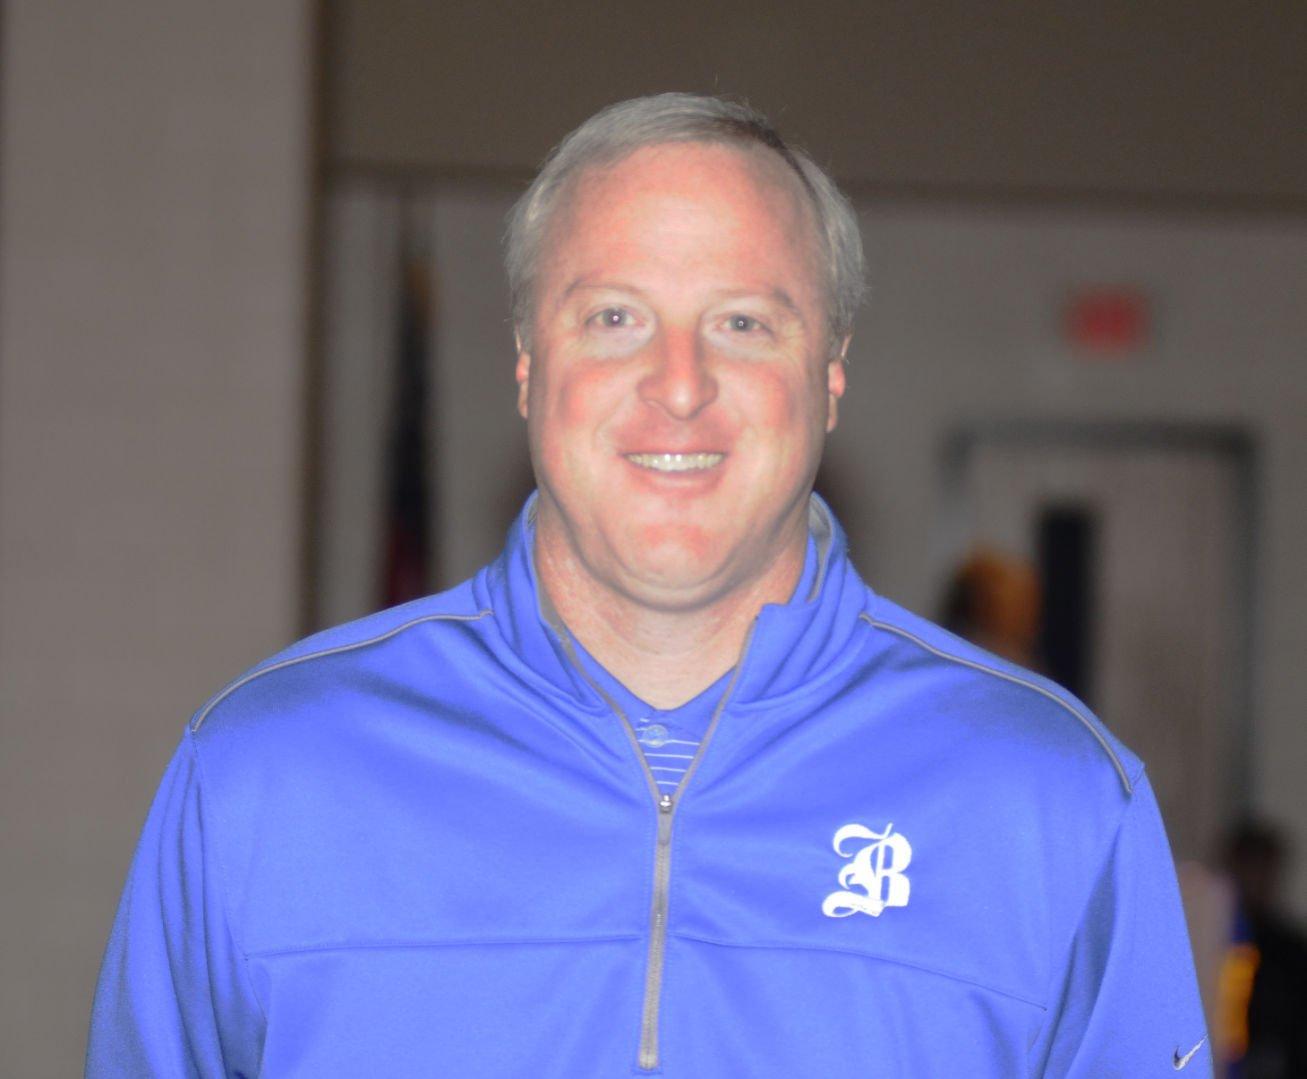 Brunswick welcomes new football coach Local